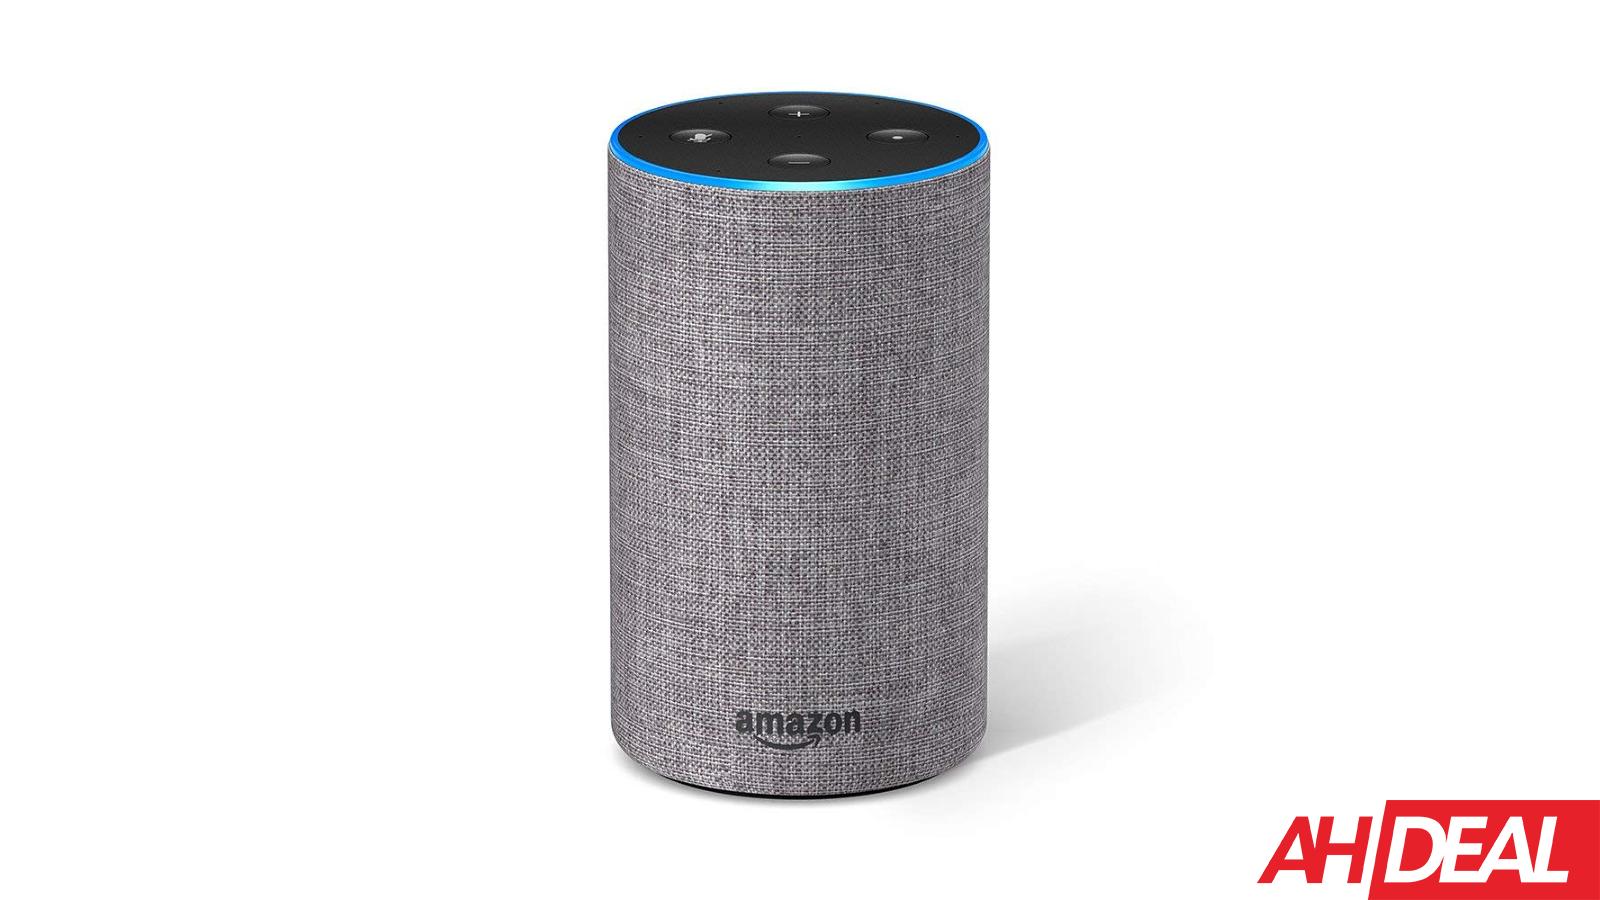 Amazon Echo (2nd Generation) $69 – Amazon Holiday Deals 2018